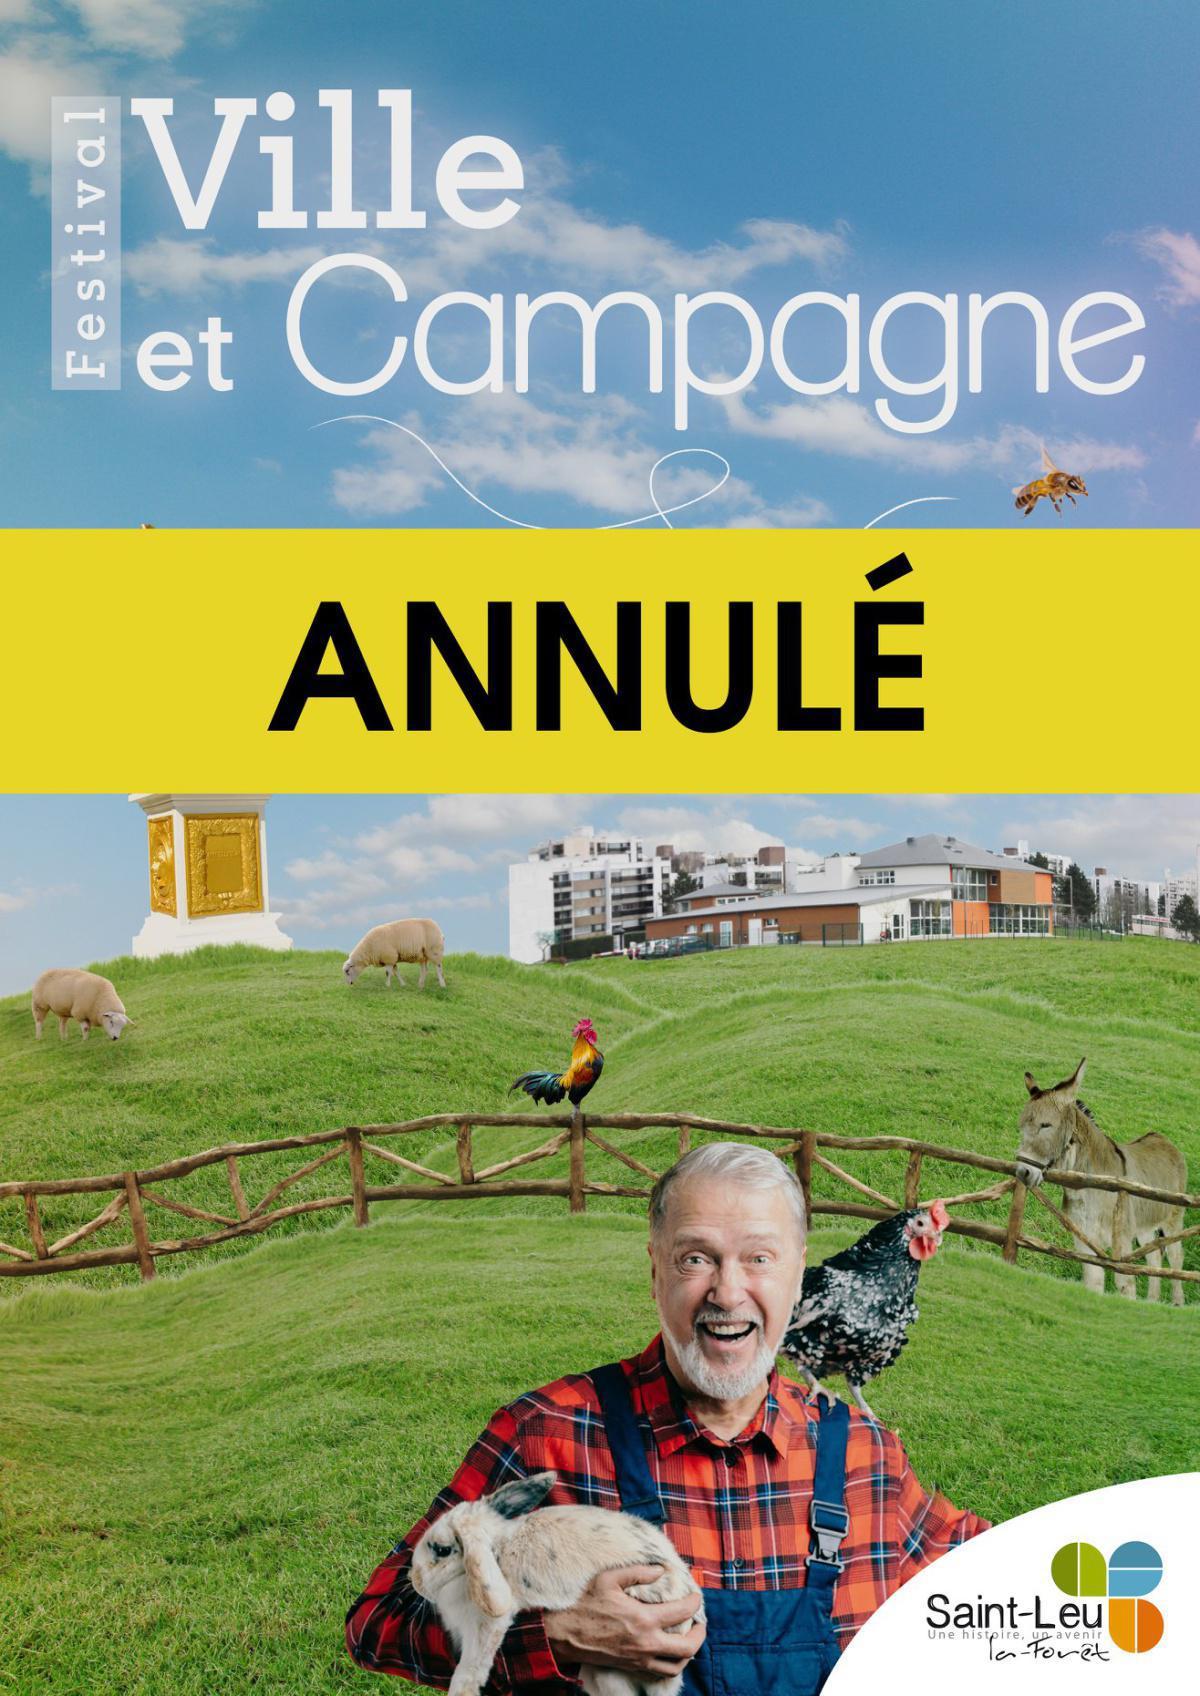 Festival Ville et Campagne